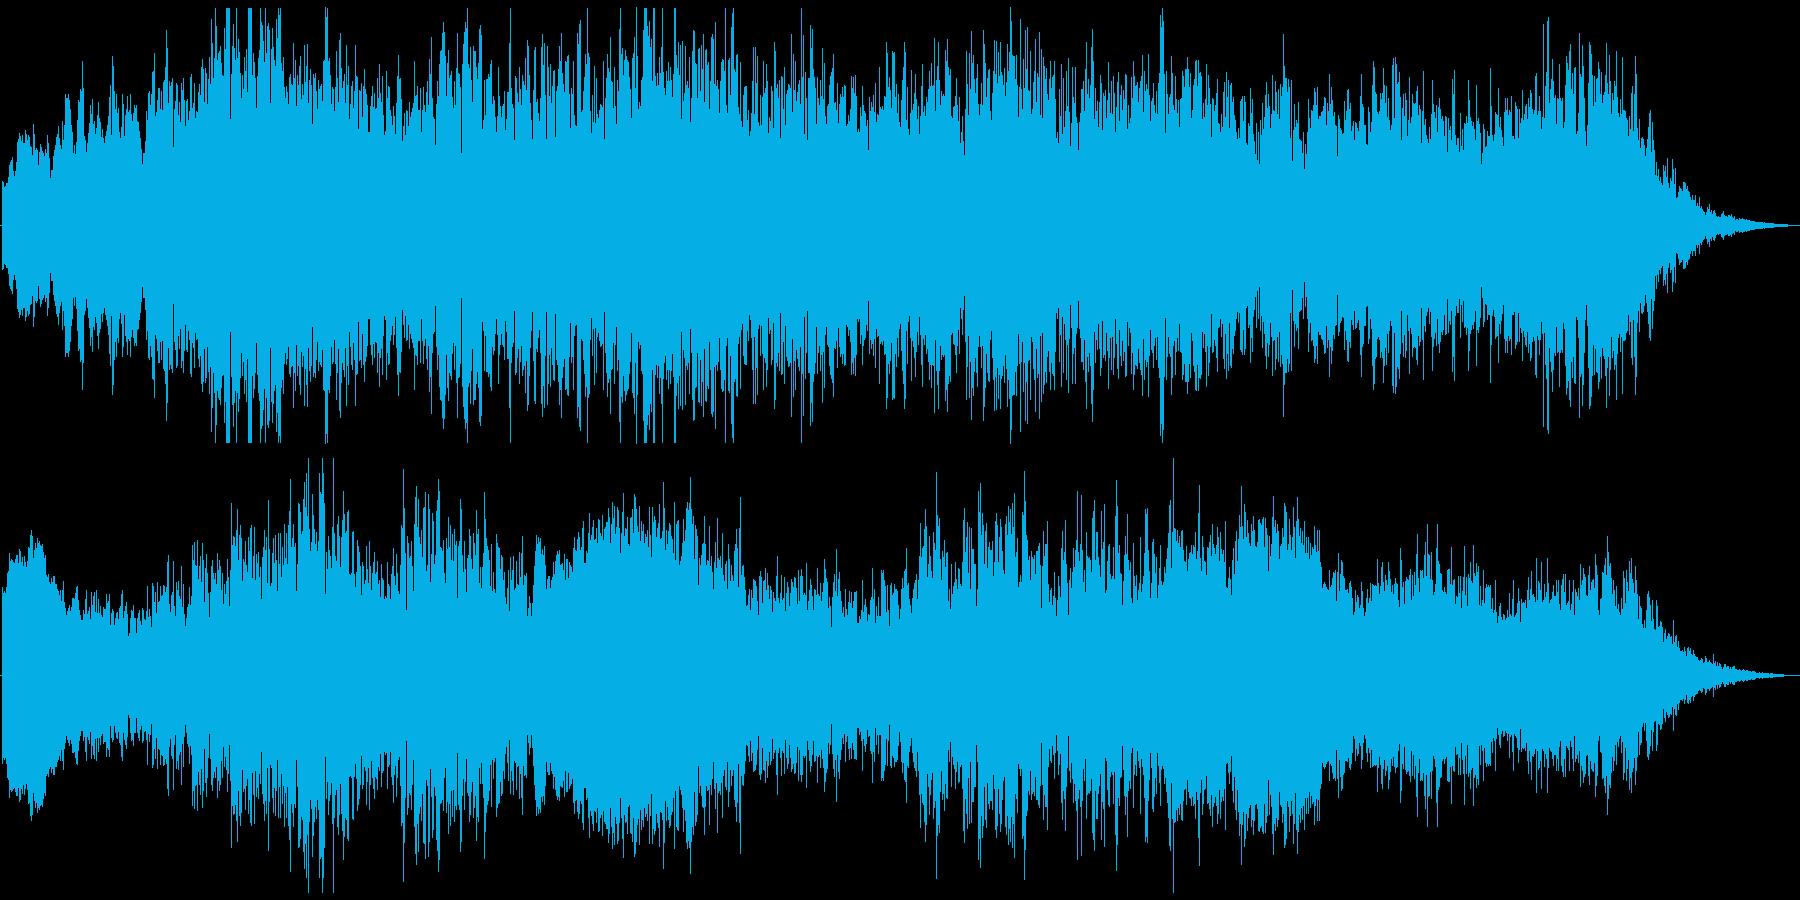 PADS 不安定な02の再生済みの波形